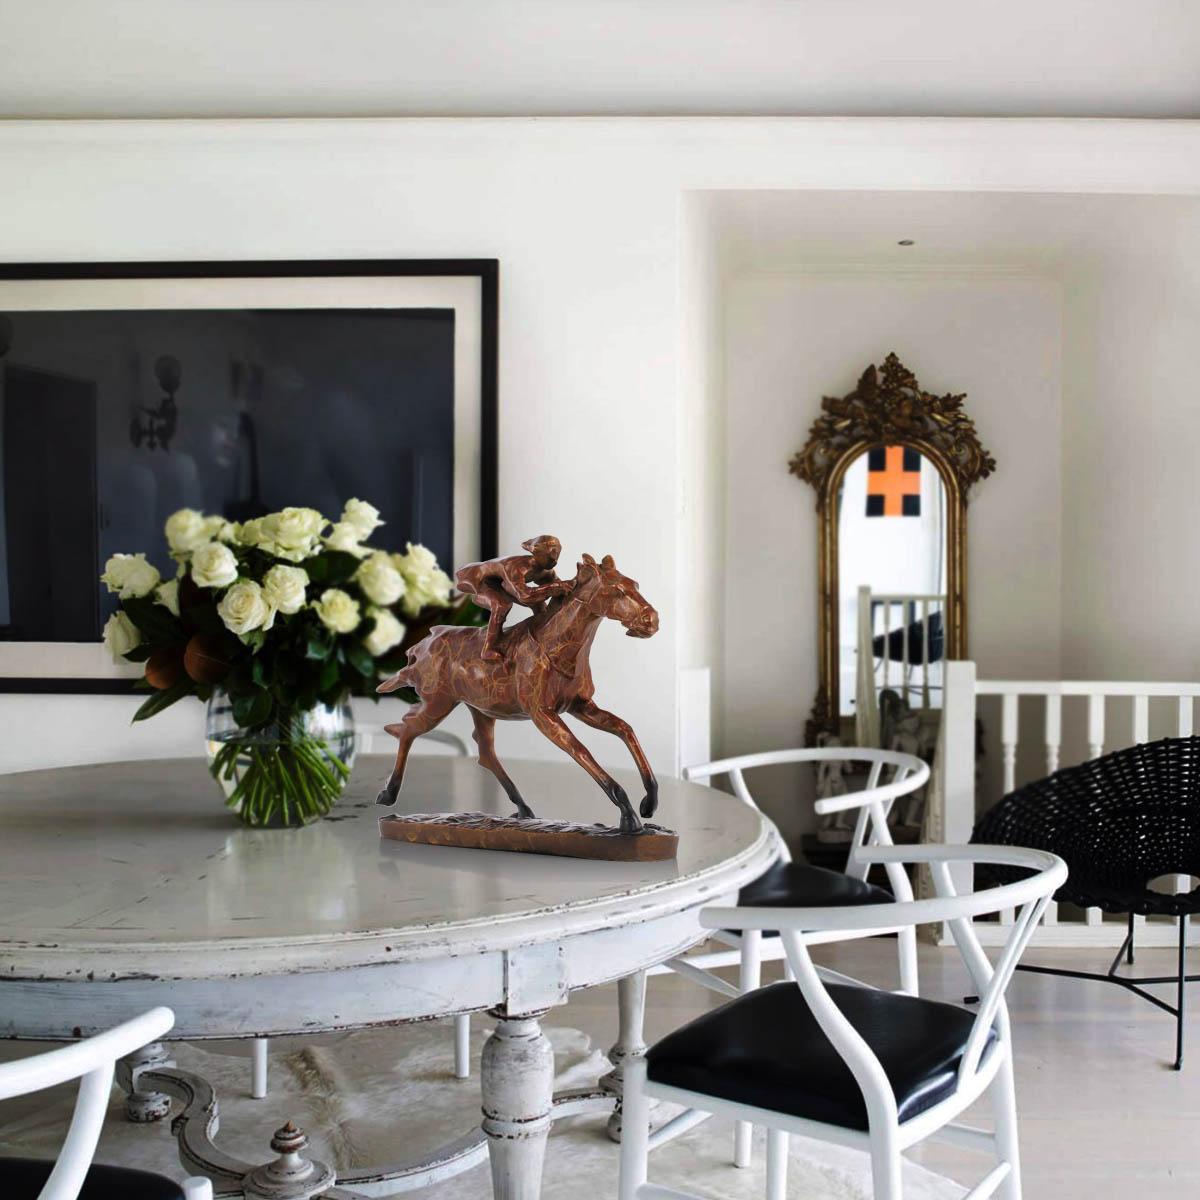 Original designed animal horse racing modern sculpture bronze sculpture decorative accessories for room home animal sculpture in statues sculptures from